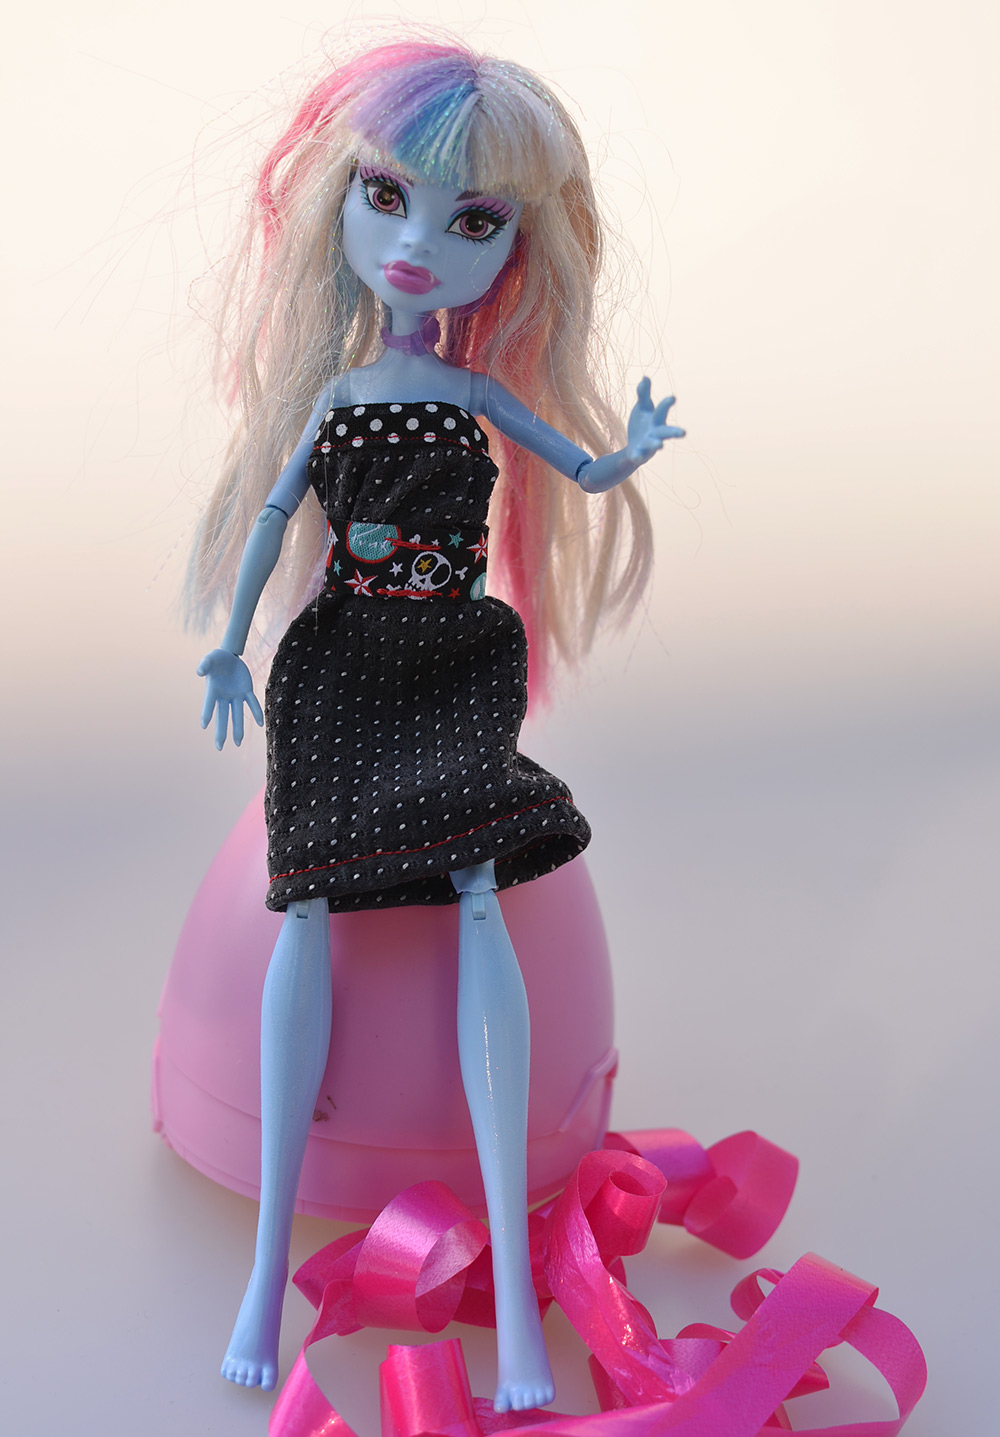 Krawatten-Upcycling: Puppenkleid für Monster High nähen